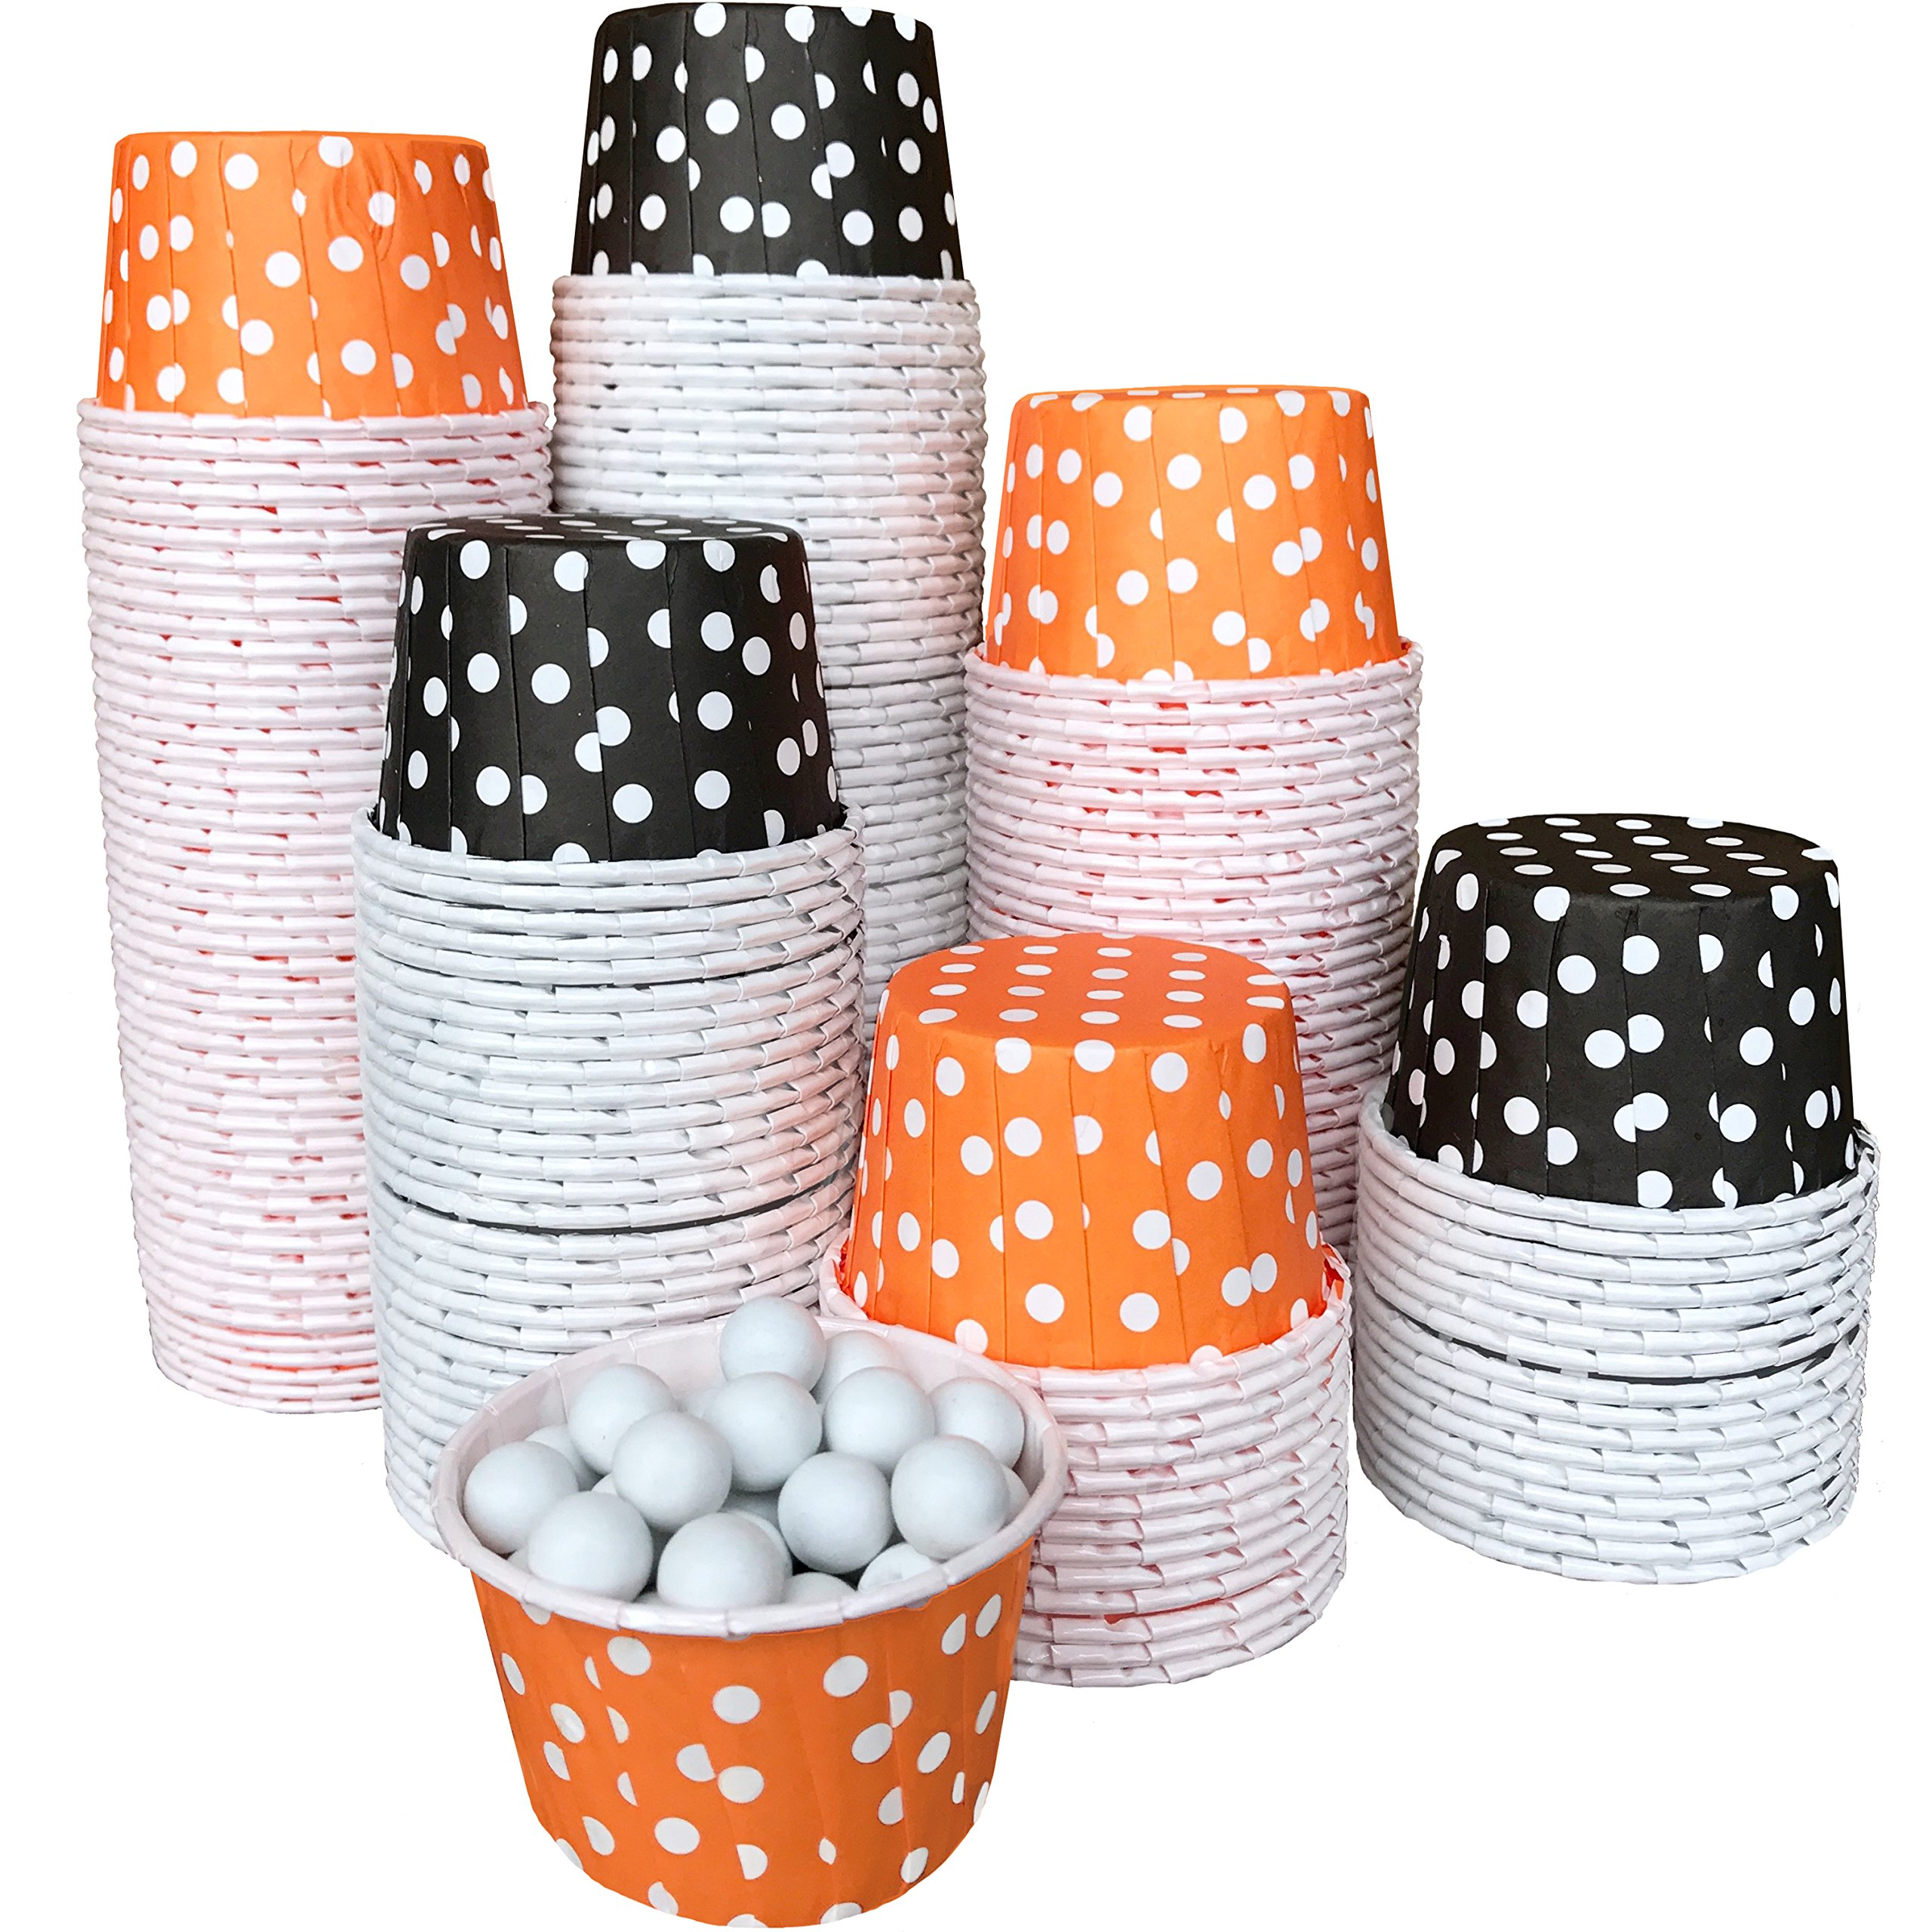 Halloween Polka Dot Bulk Candy Nut Mini Baking Cups 200 Pack Orange, Black, White